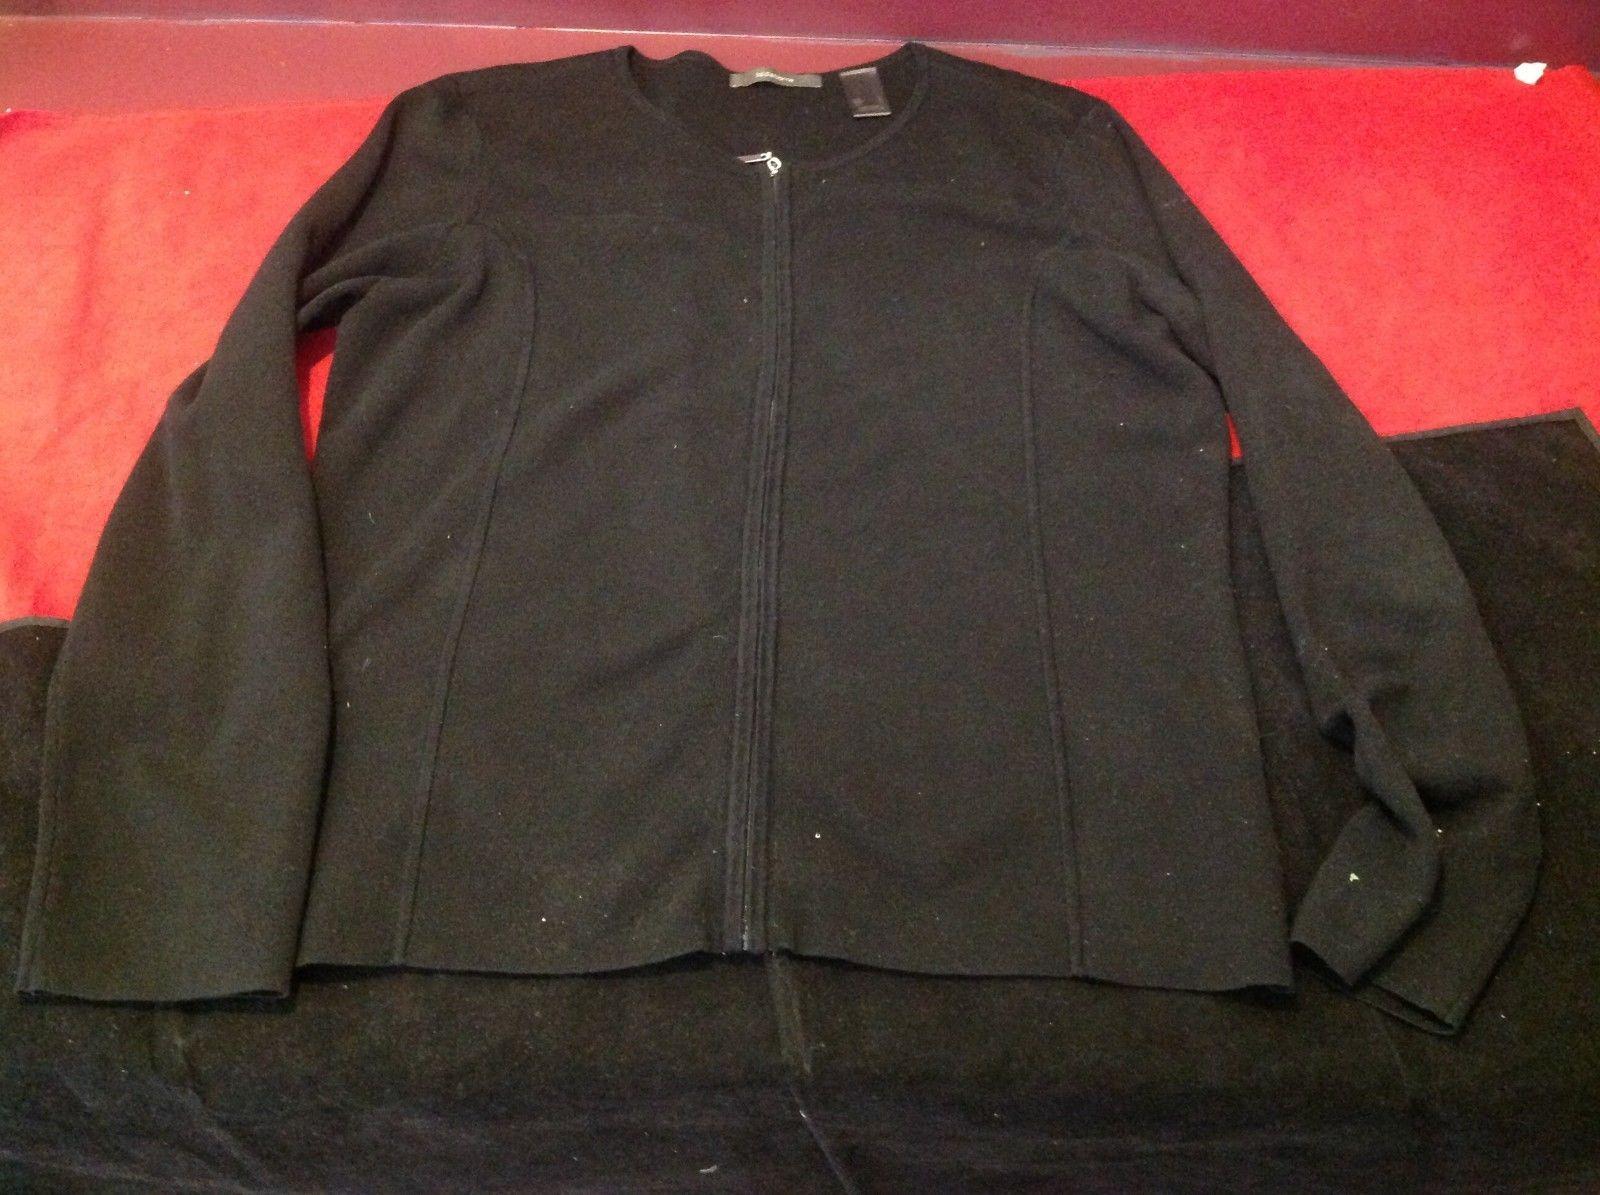 Liz Claiborne Women's black cardigan zipper sweater size large